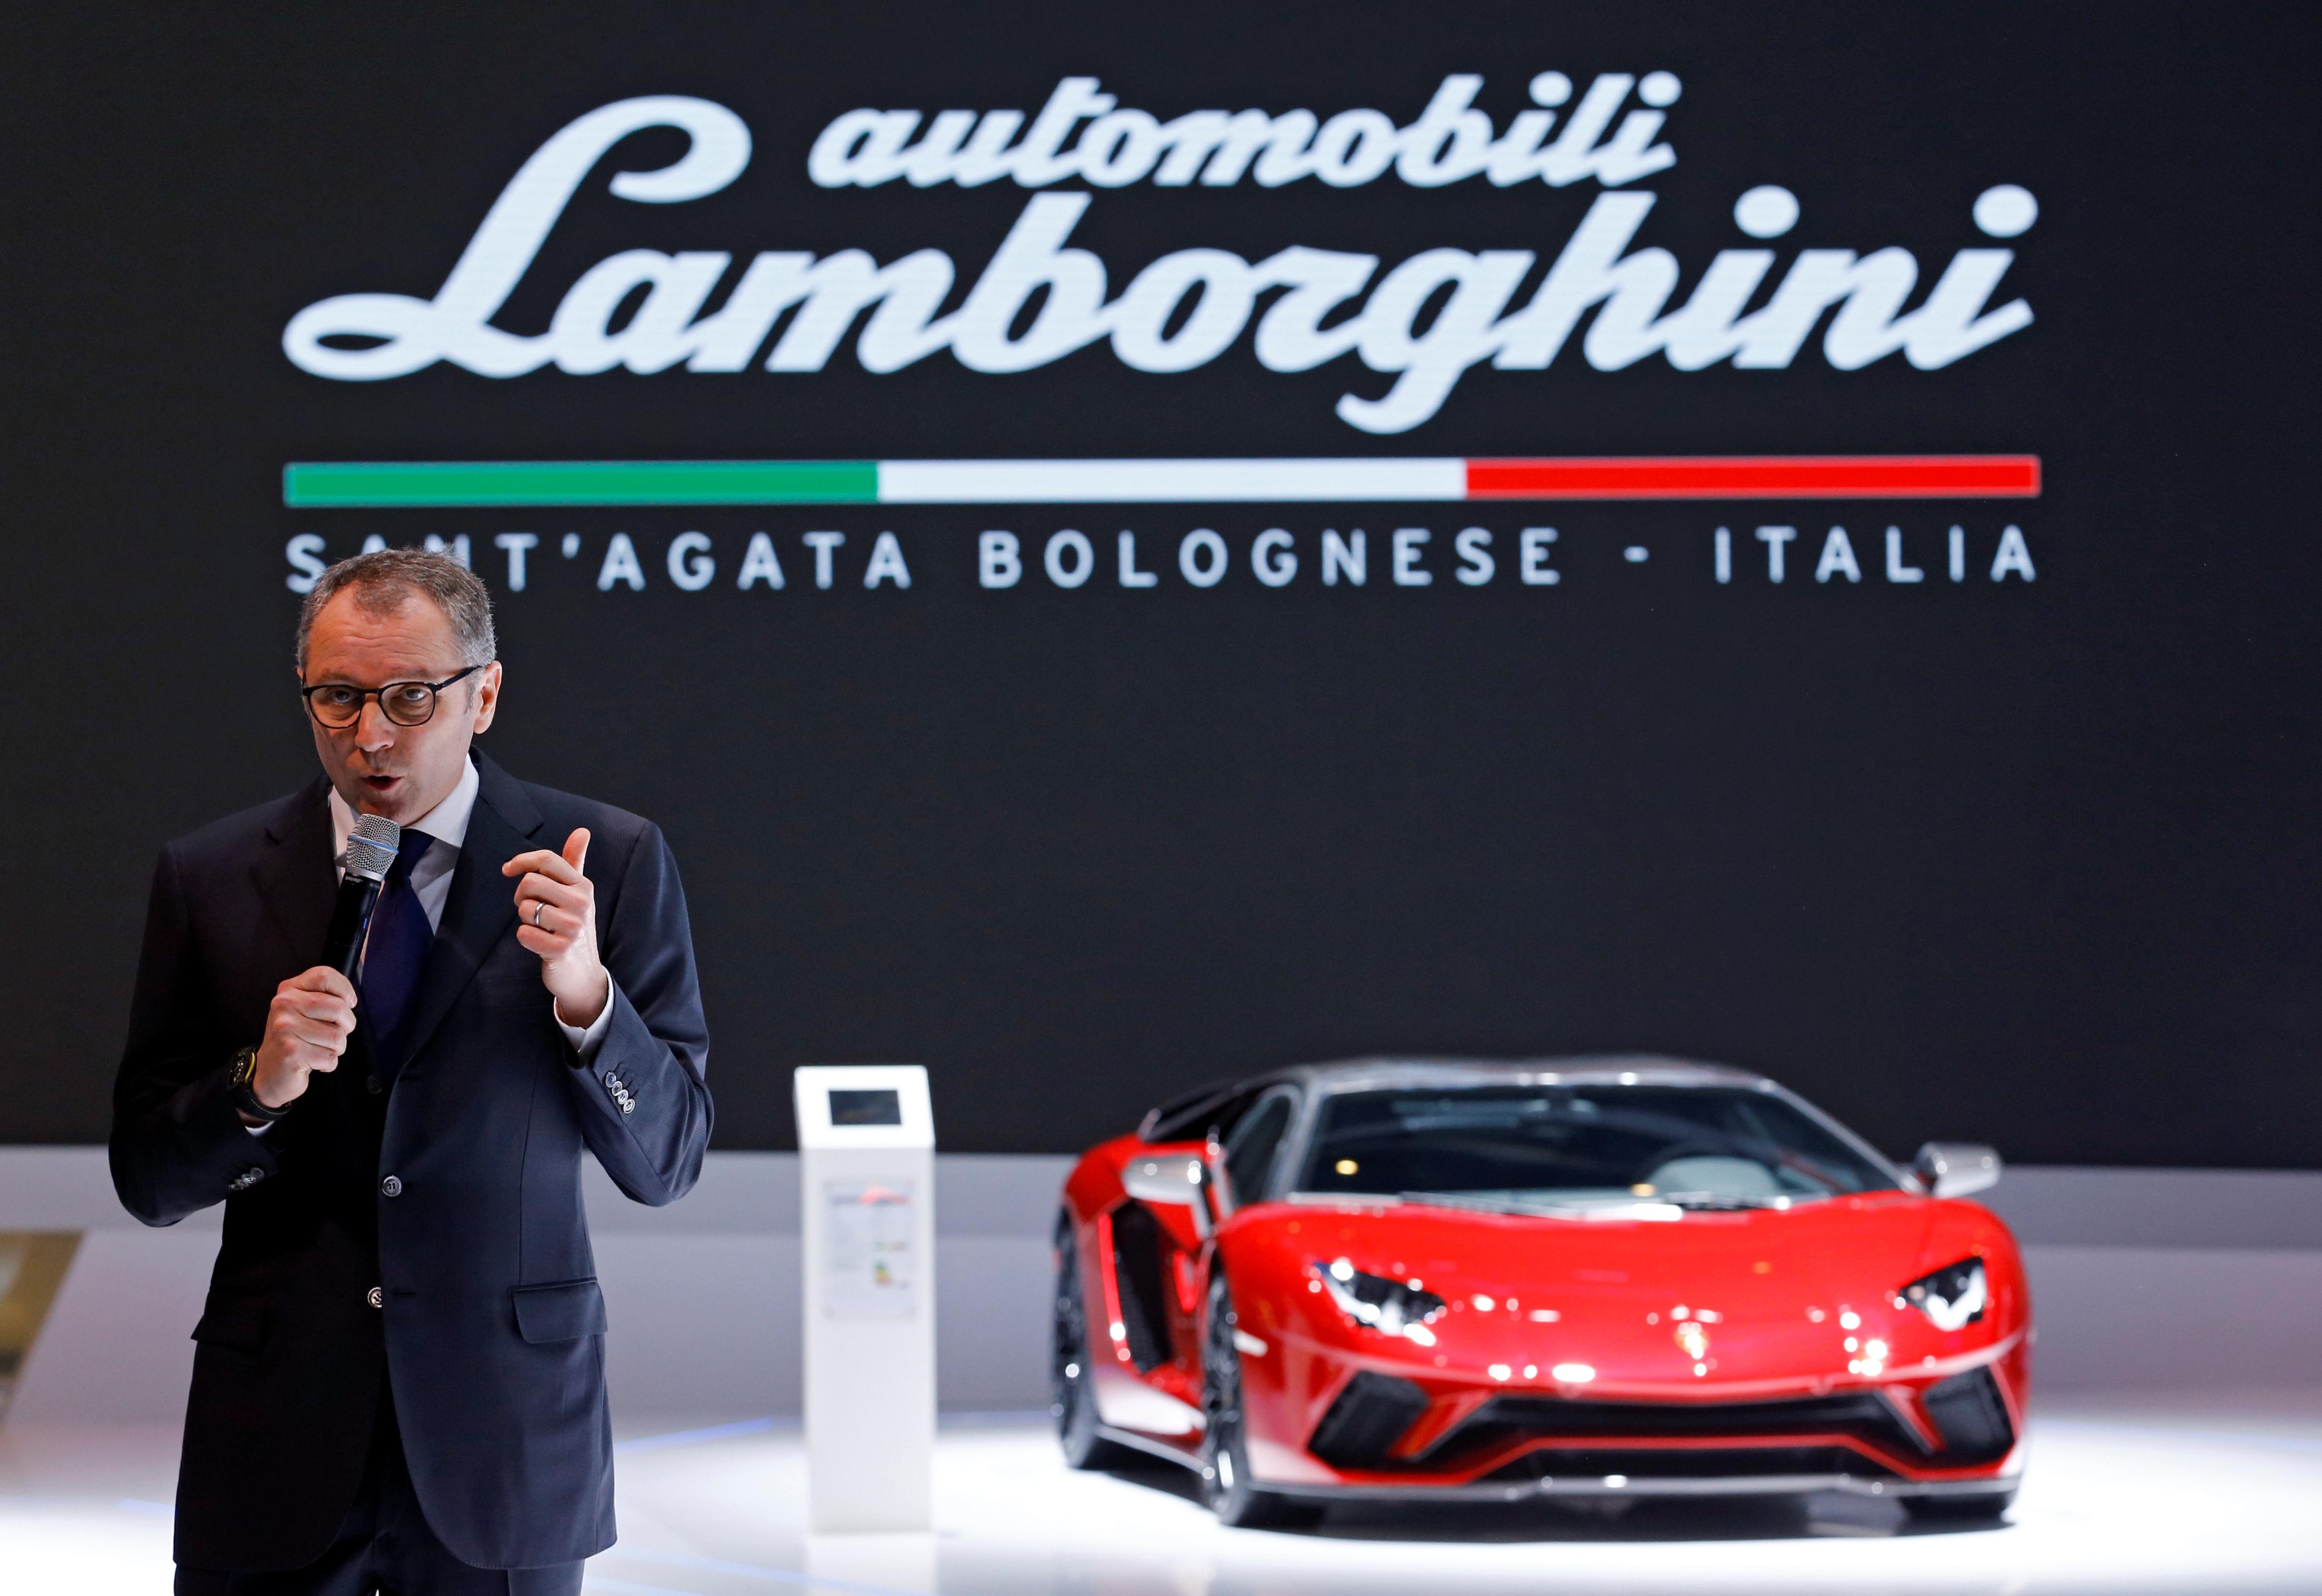 Automobili Lamborghini CEO Stefano Domenicali speaks during a presentation at the 88th International Motor Show at Palexpo in Geneva, Switzerland, March 6, 2018.  REUTERS/Denis Balibouse